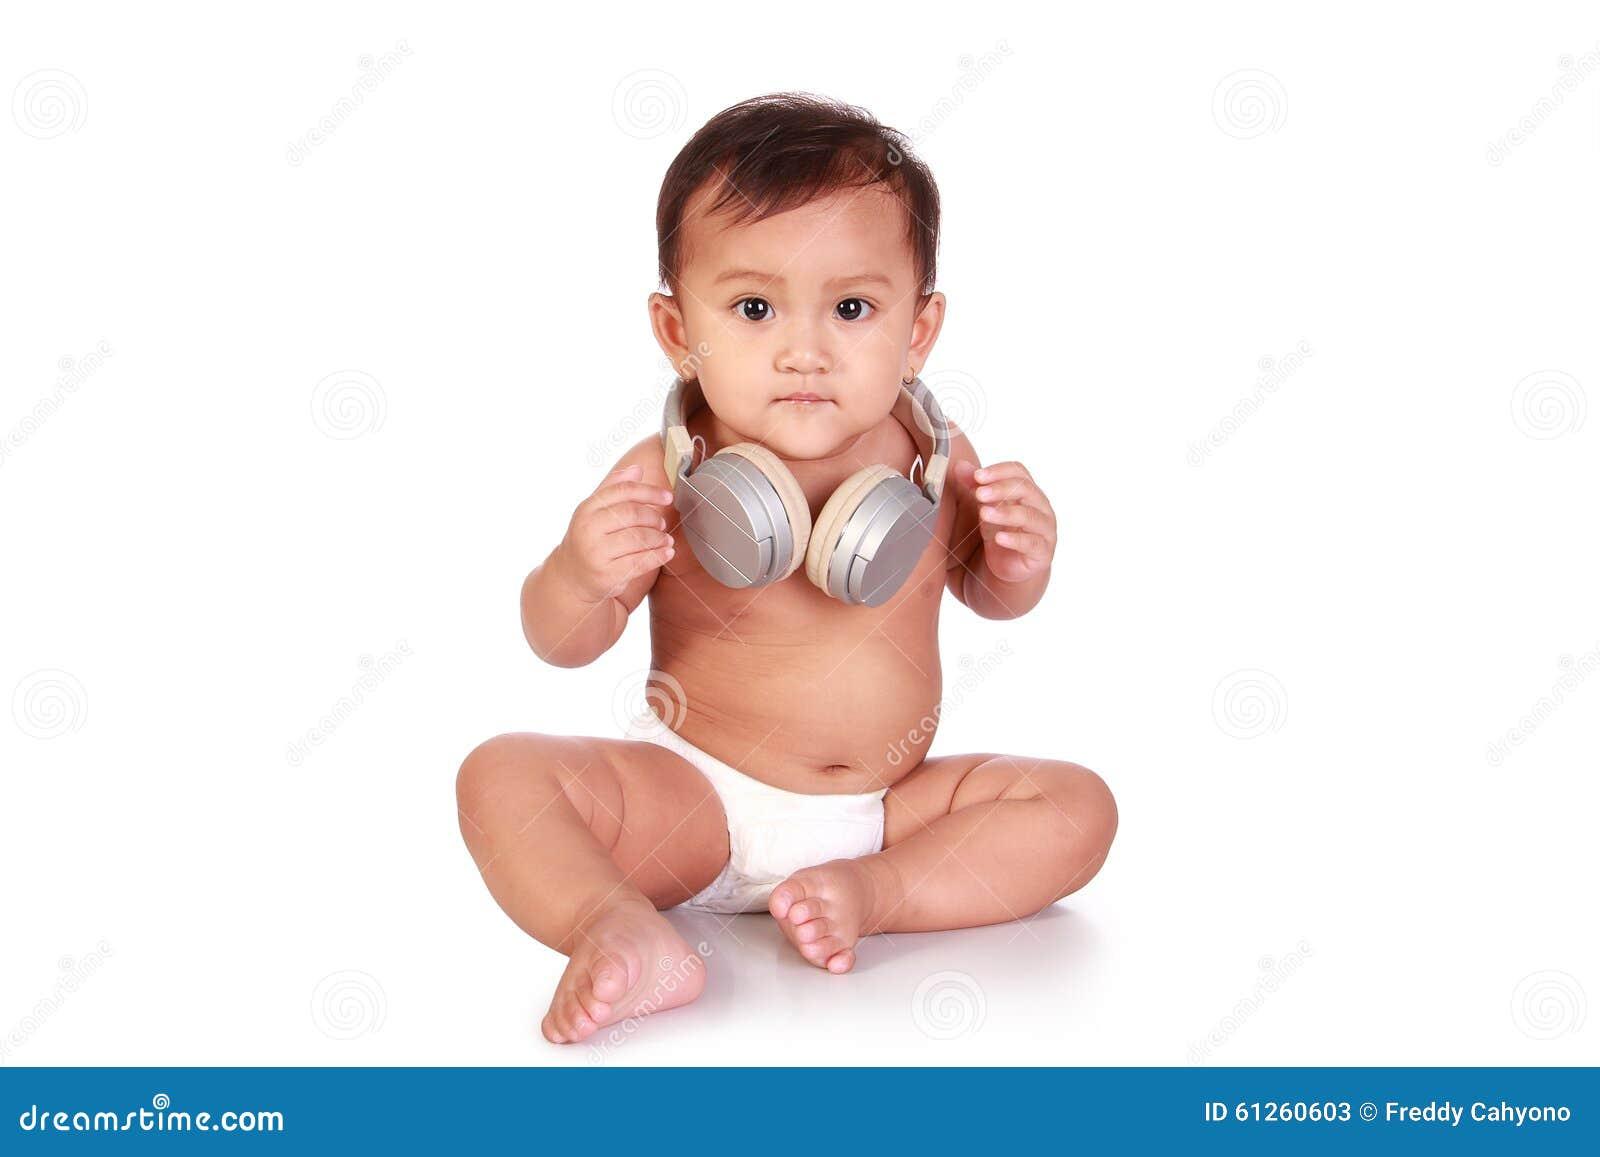 dj baby stock photo - image: 61260603